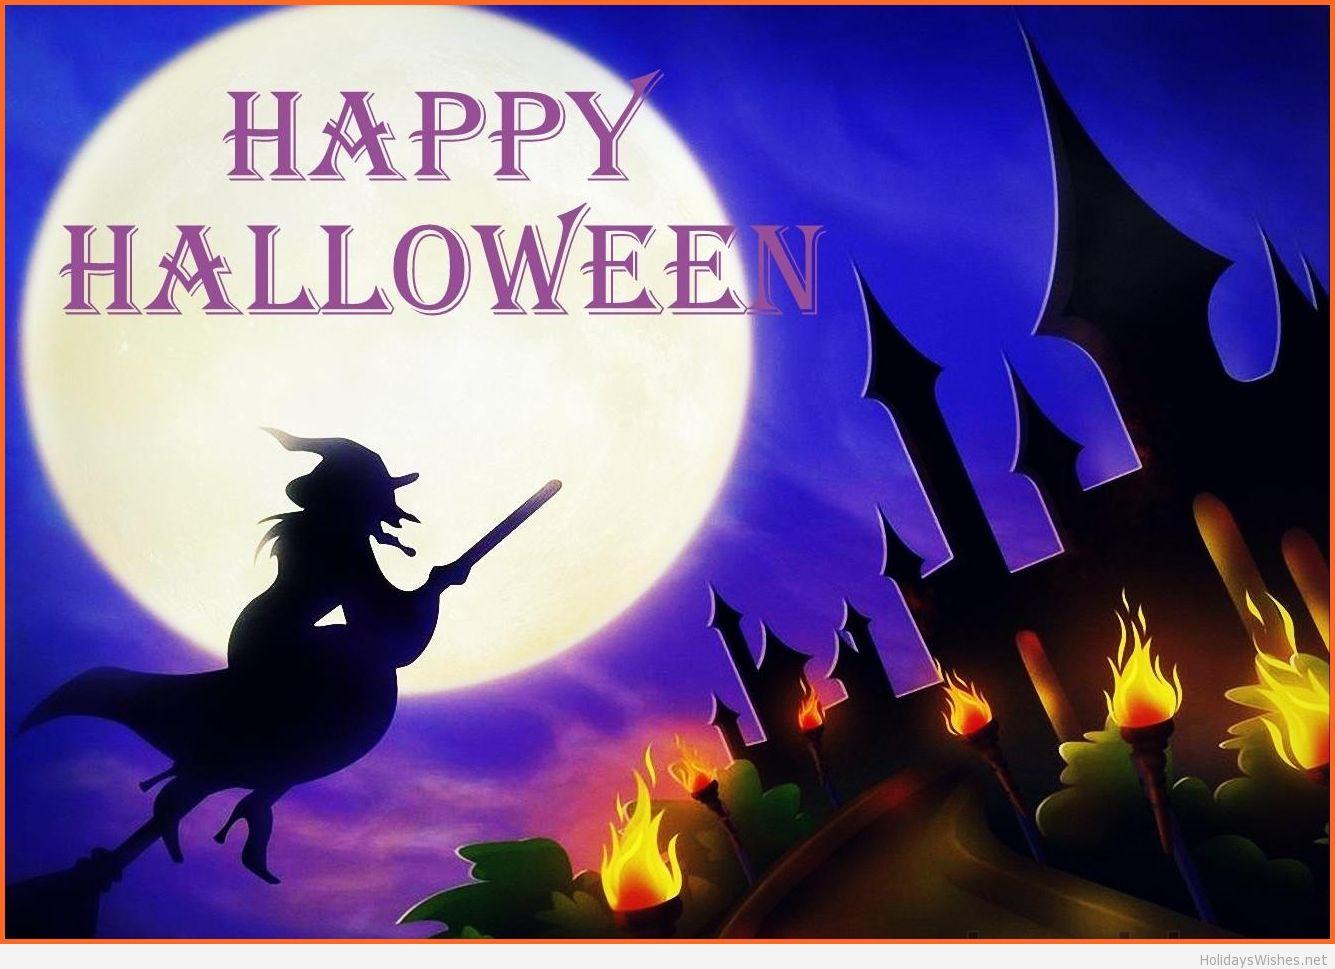 Happy-Halloween-witch-image